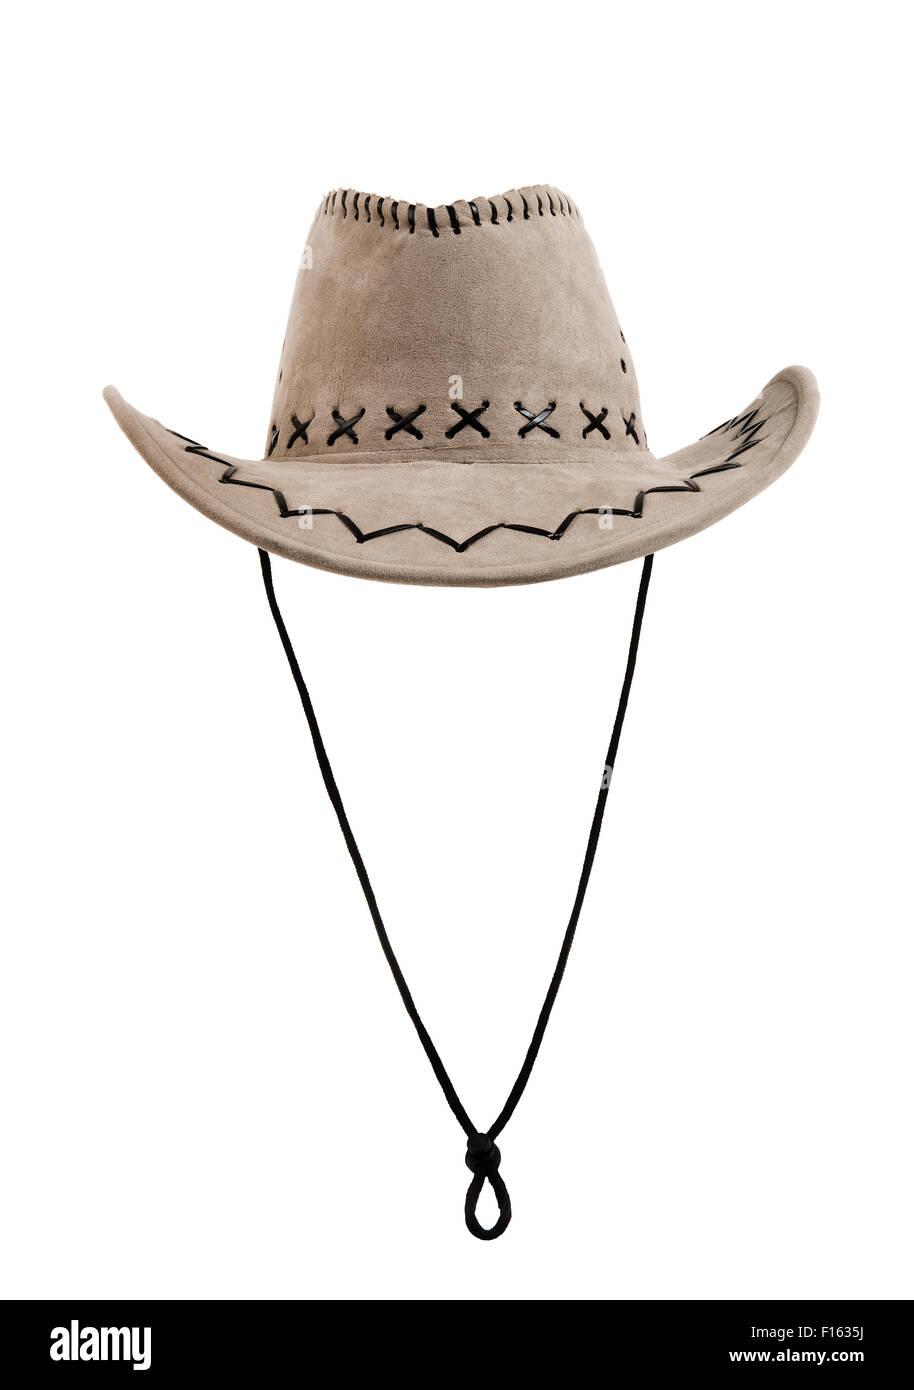 Stetson Hat Immagini   Stetson Hat Fotos Stock - Alamy 48b96c405ce6